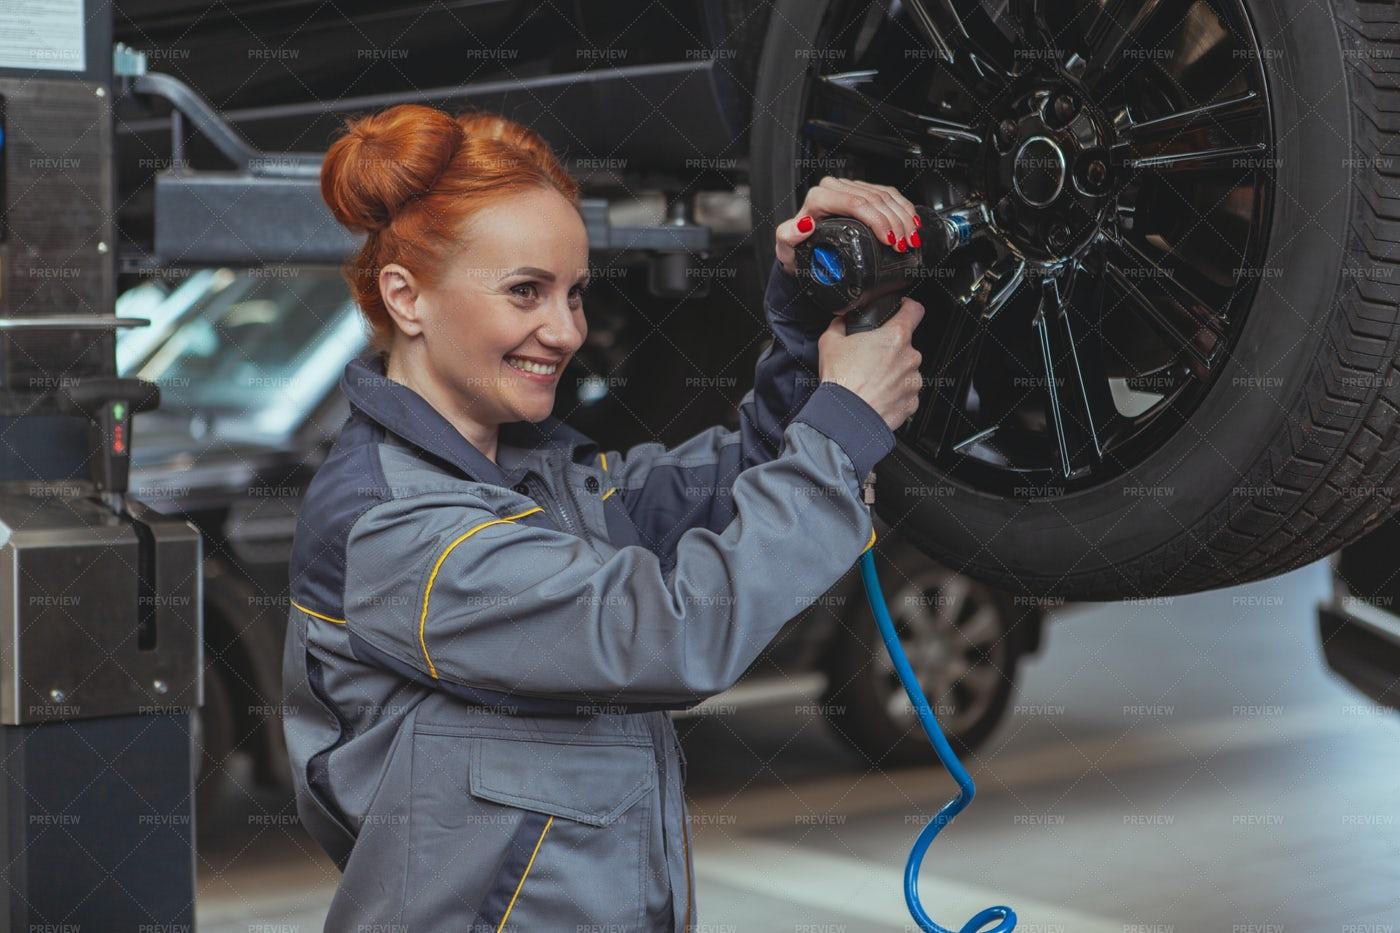 Mechanic Changes A Wheel: Stock Photos